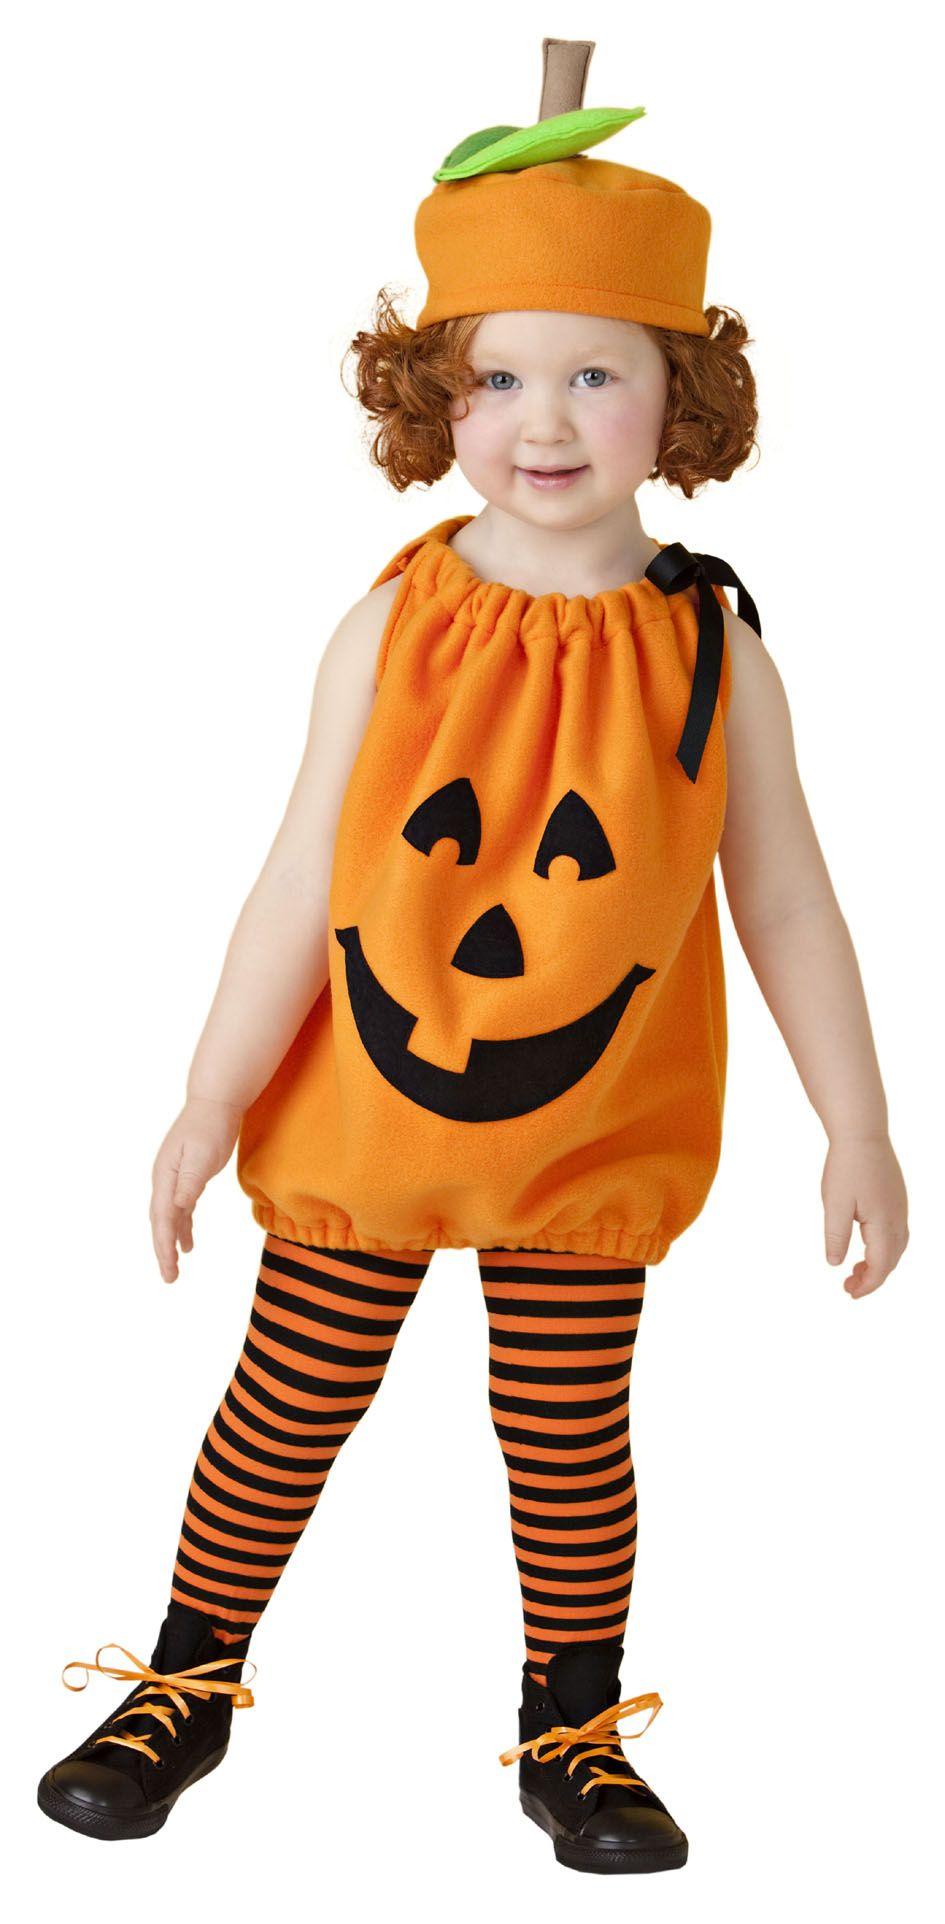 Image detail for Pumpkin costume pattern Kids pumpkin